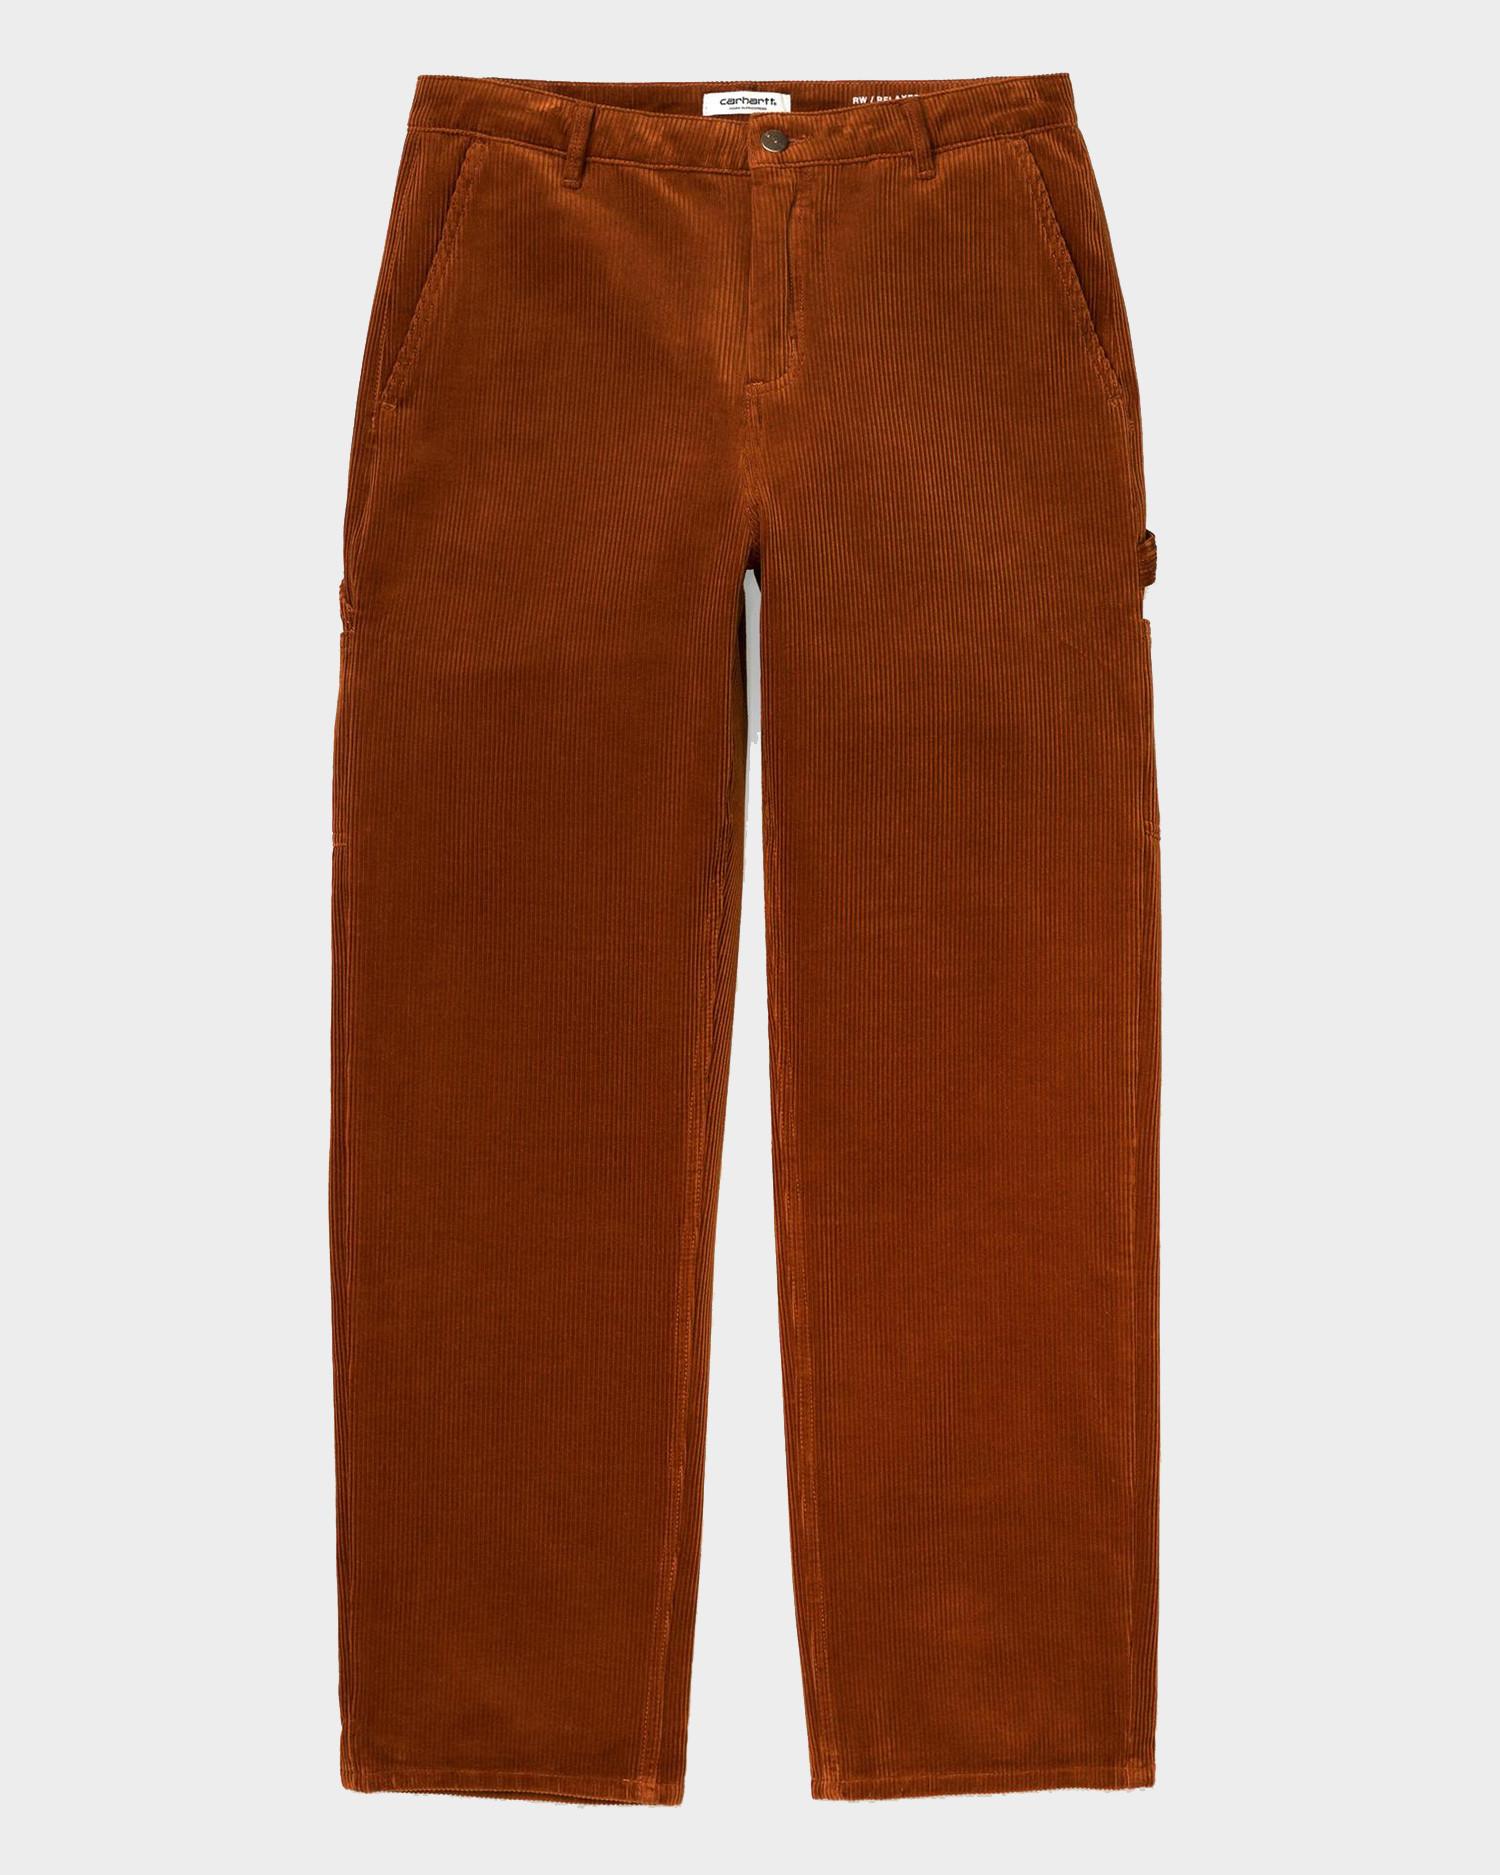 Carhartt W' Pierce Pant Straight Cotton Brandy Rinsed